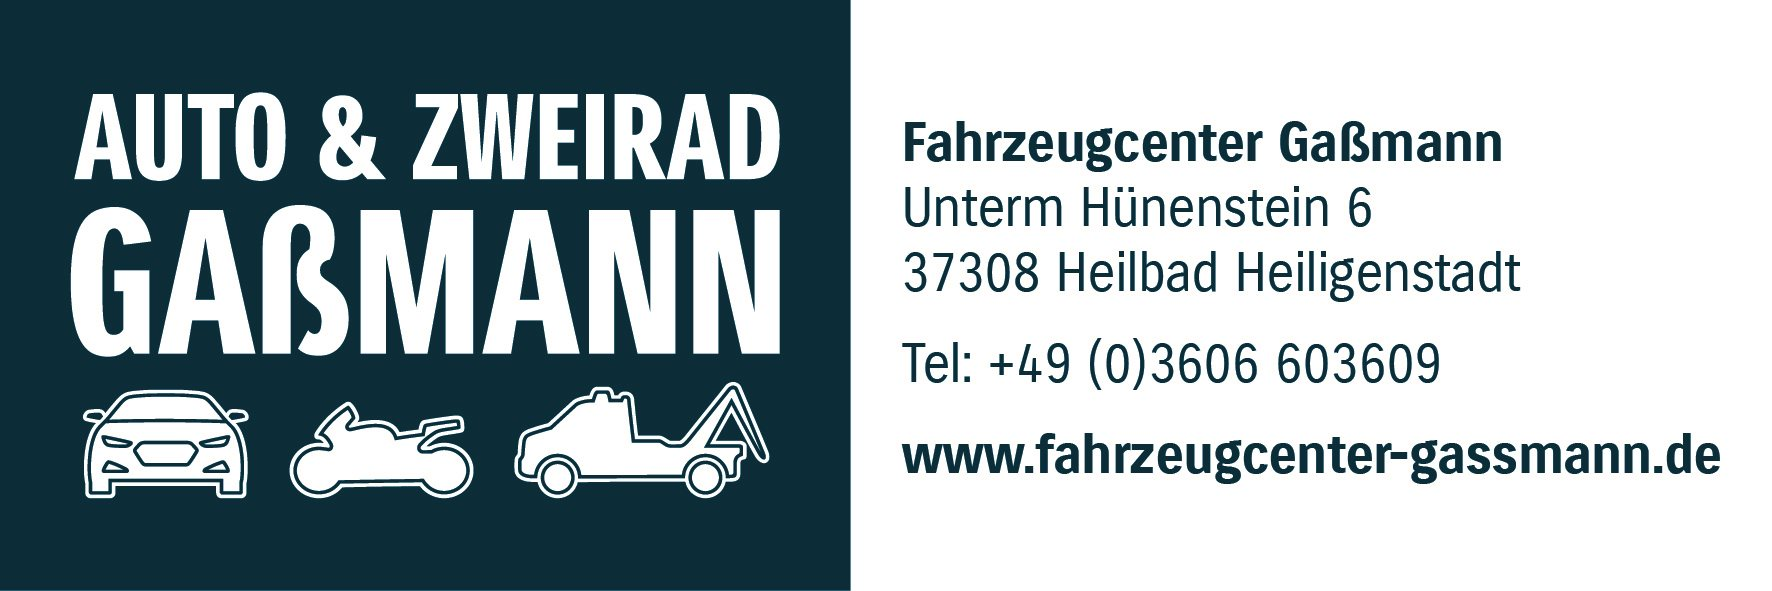 Fahrzeugcenter Gaßmann Logo